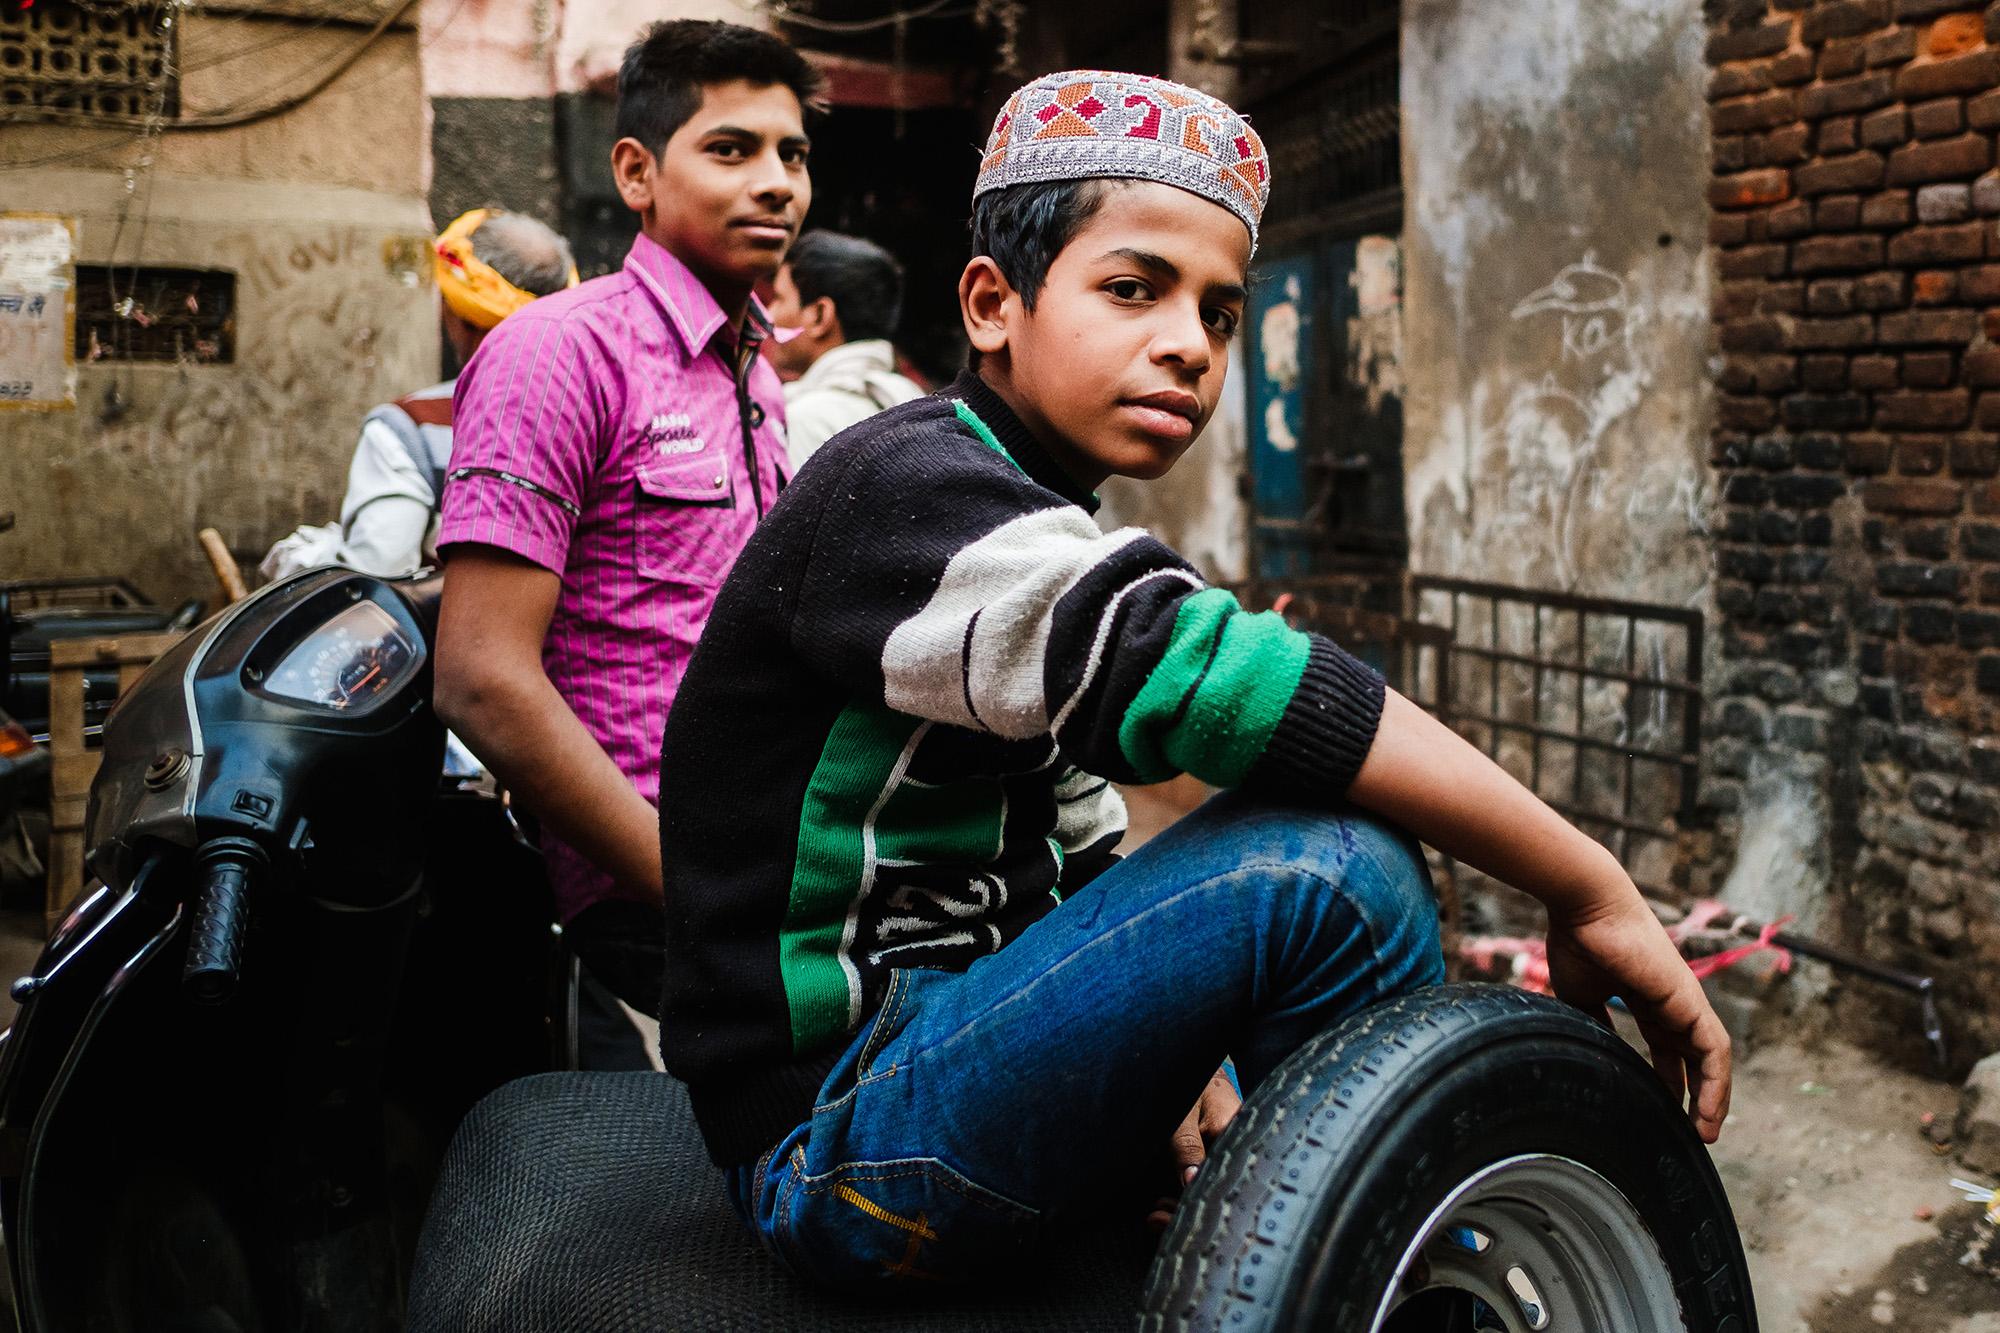 AnjaPoehlmann_India-Delhi_022.jpg